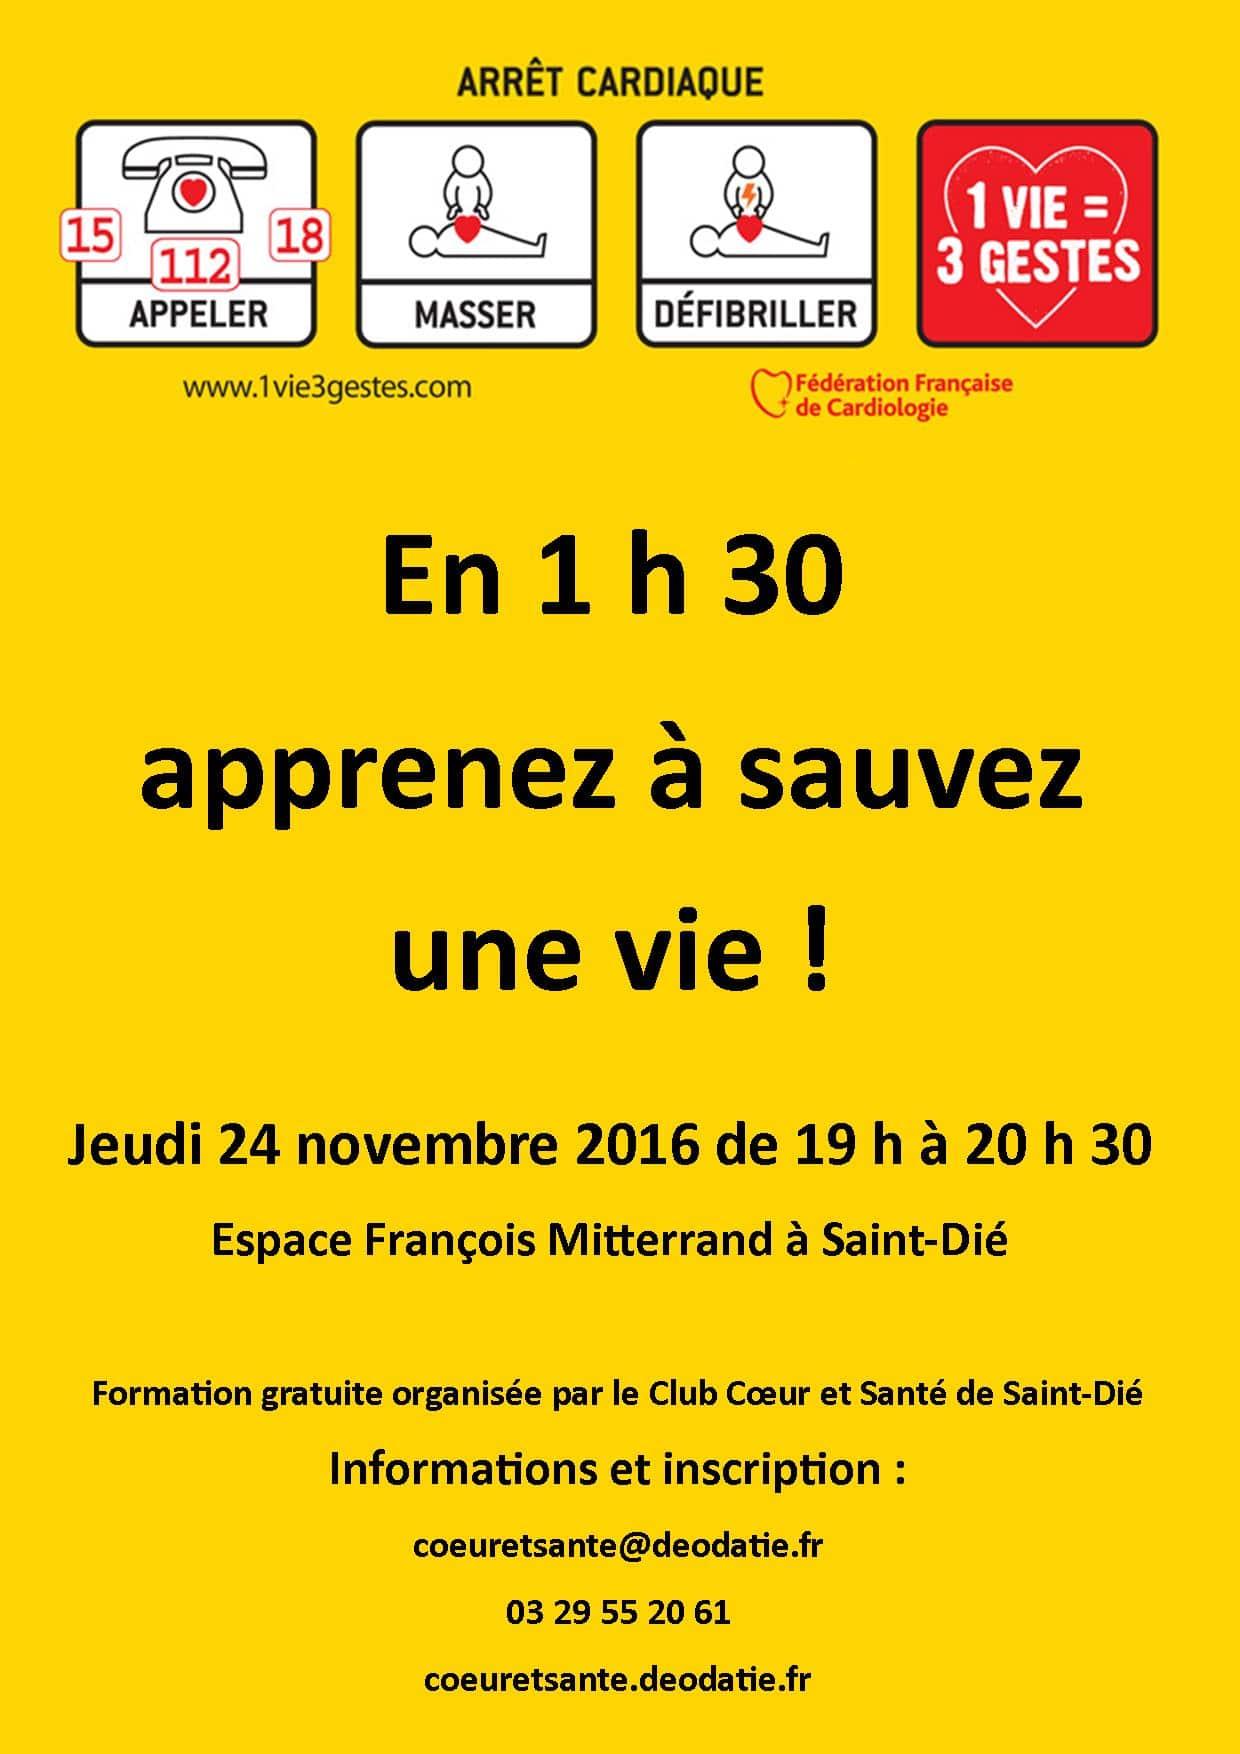 affiche-gestes-durgence-24-11-2016